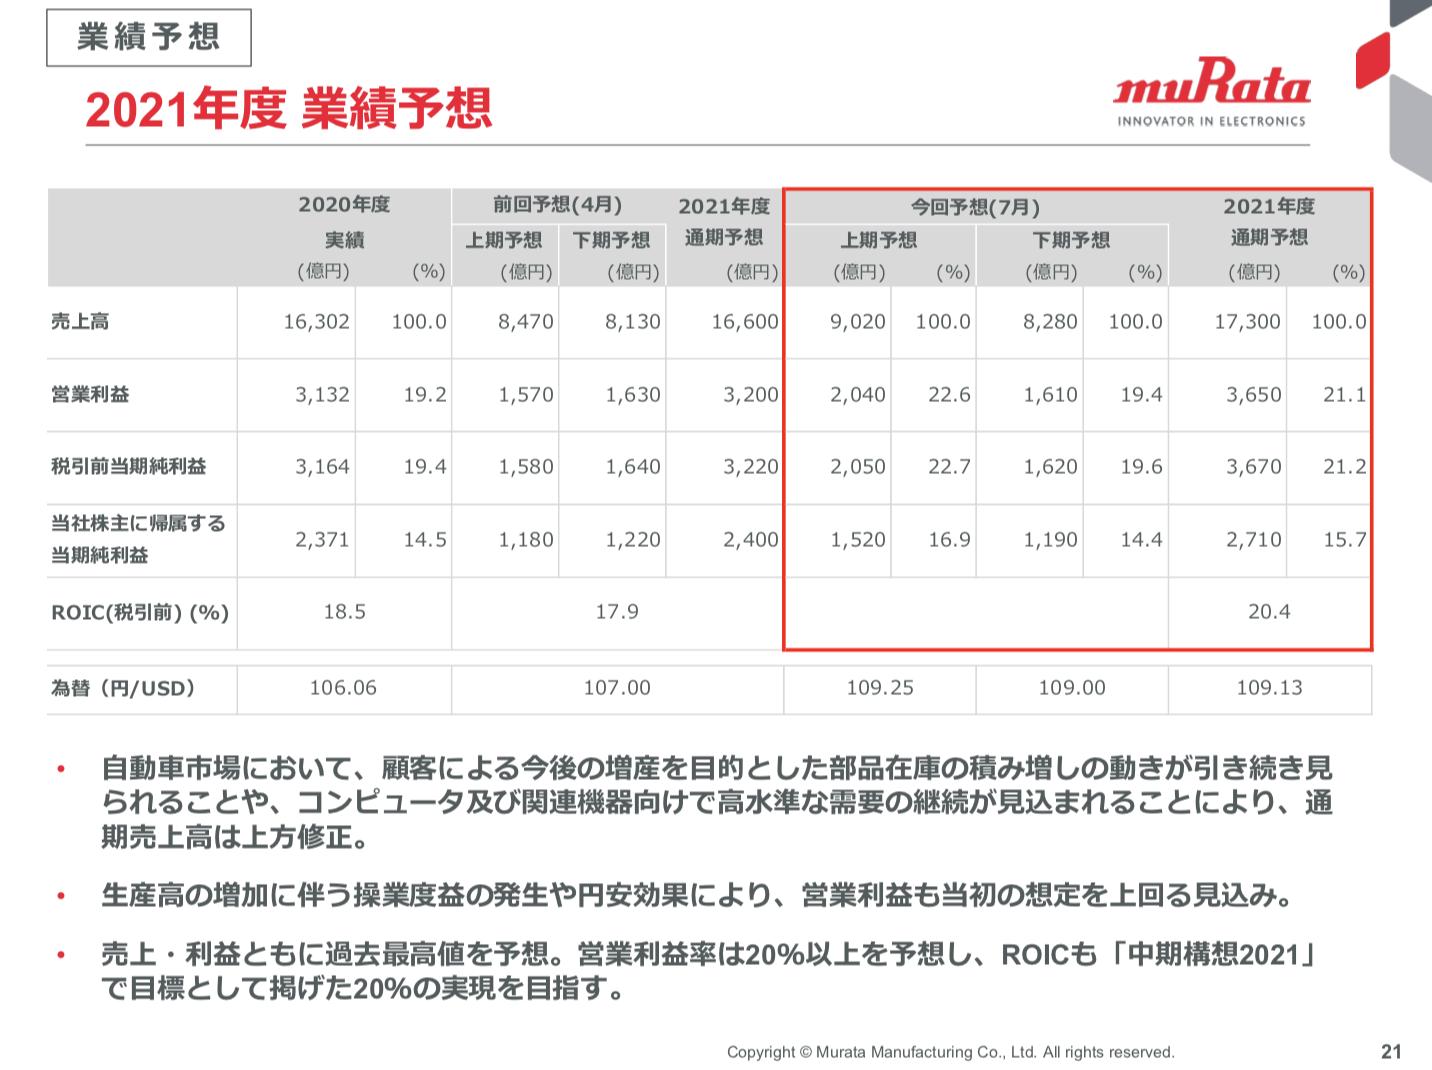 村田製作所 2021年度1Q決算を徹底解説! さとり世代の株日記 資産運用 株 投資 資産形成